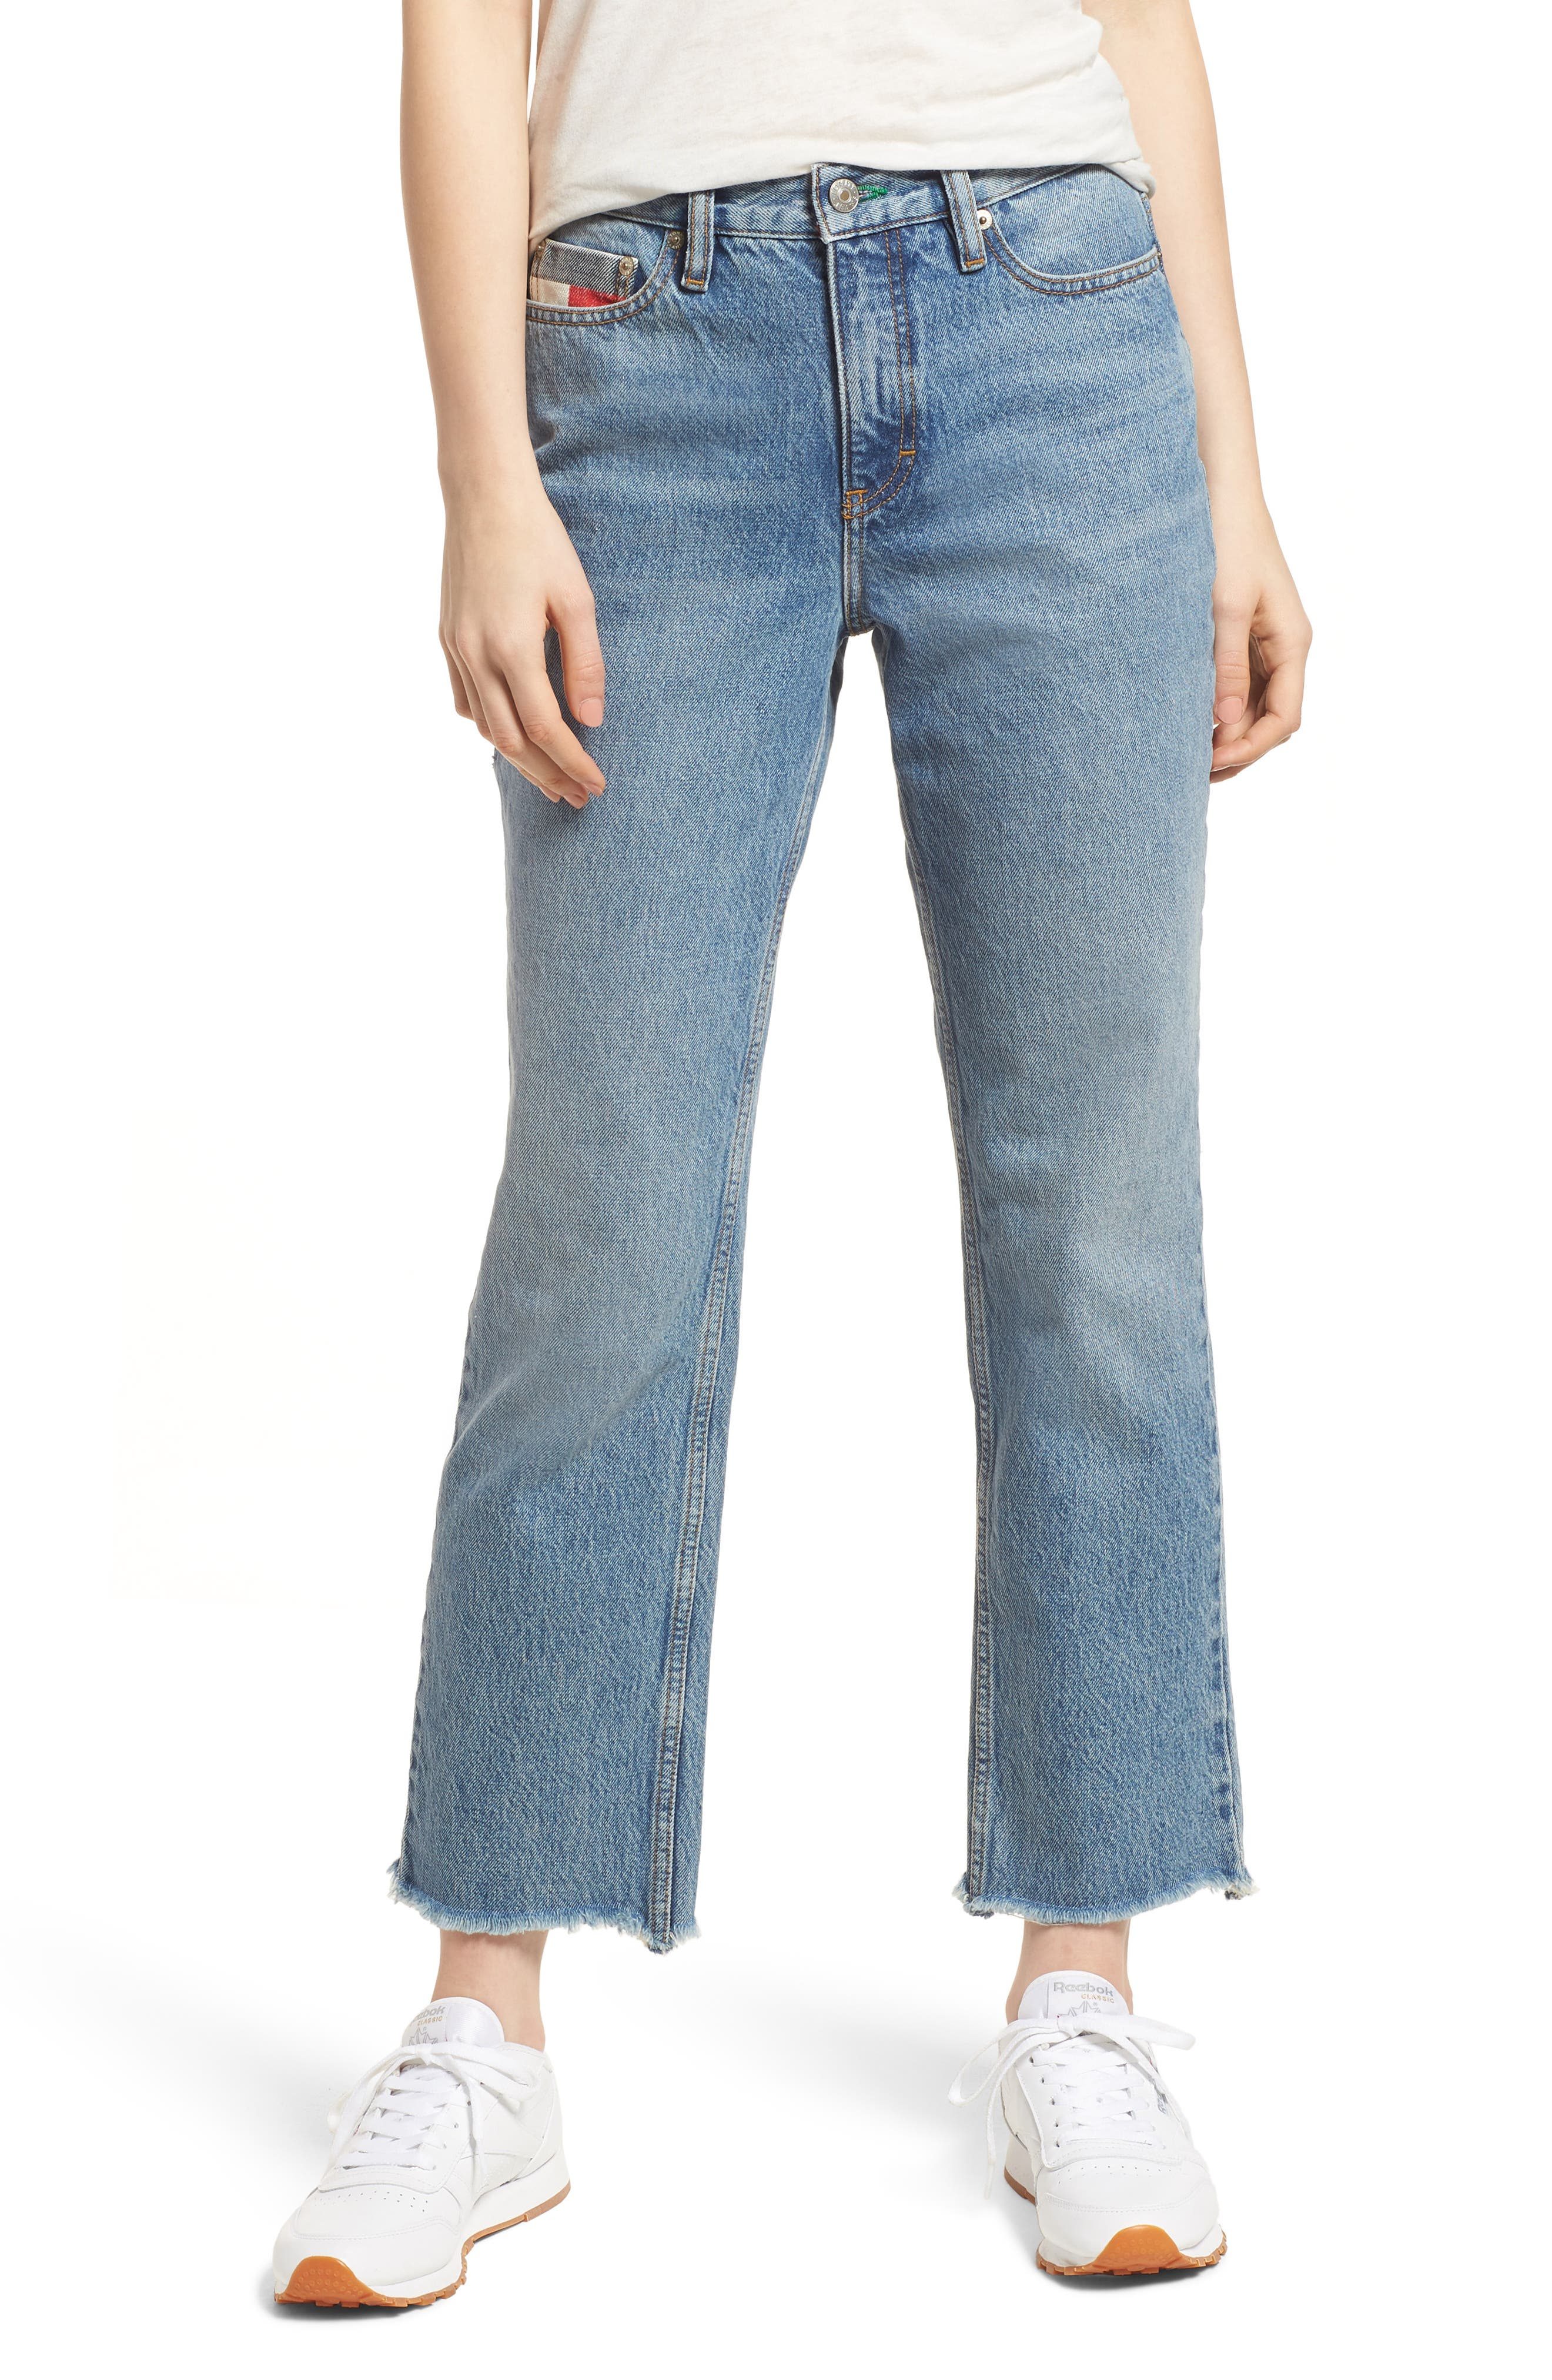 TJW 90s Mom Jeans,                             Main thumbnail 1, color,                             Mid Blue Denim